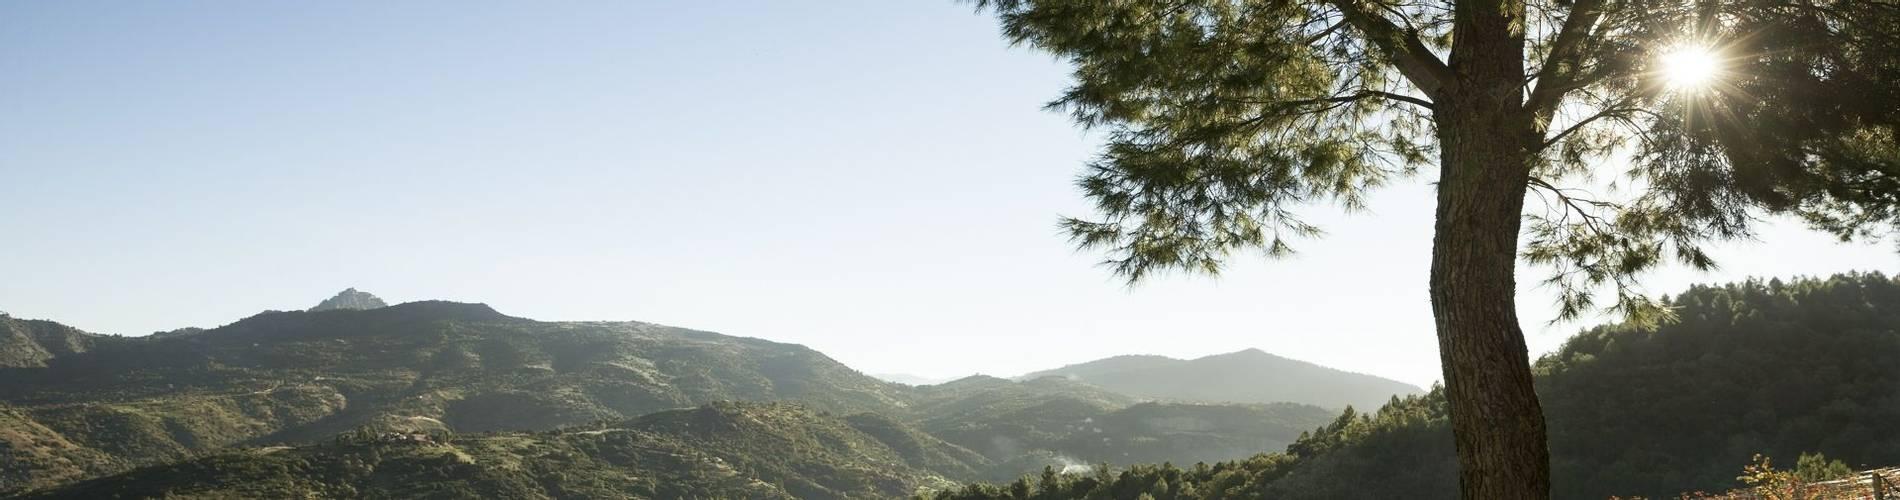 Santa Anastasia, Sicily, Italy (5).jpg